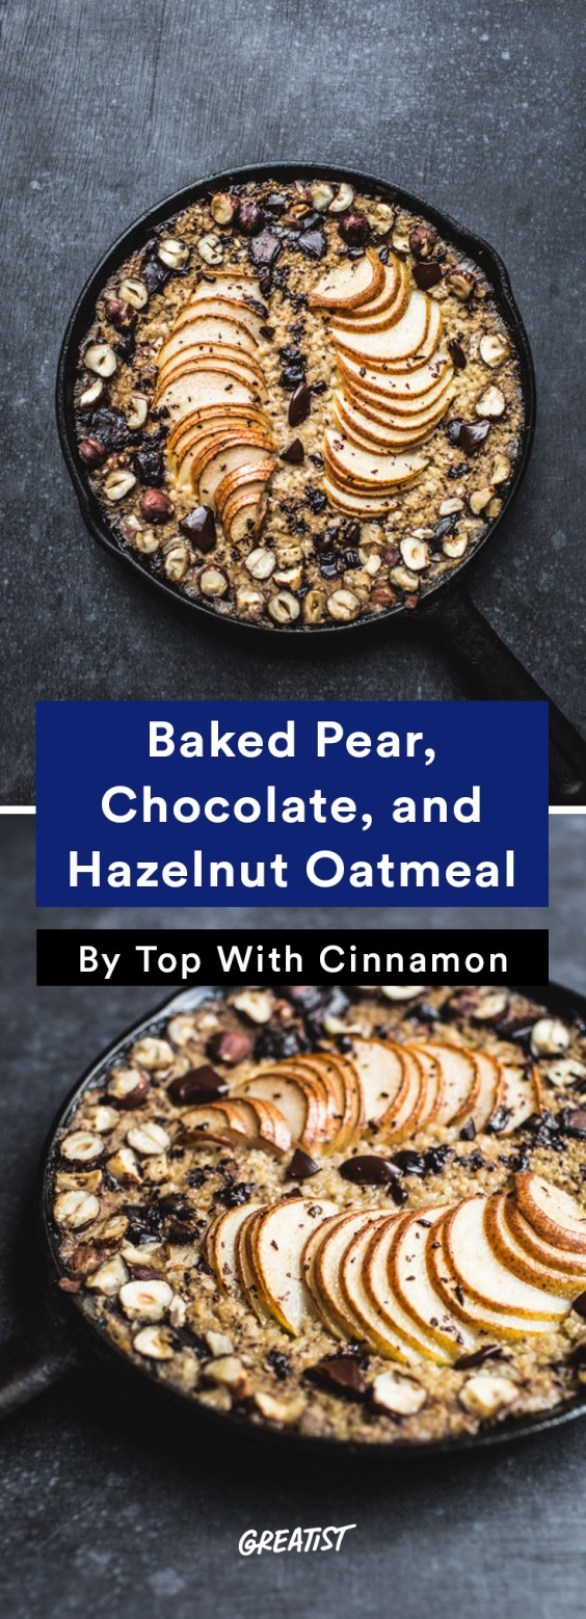 Baked Pear Chocolate Oatmeal